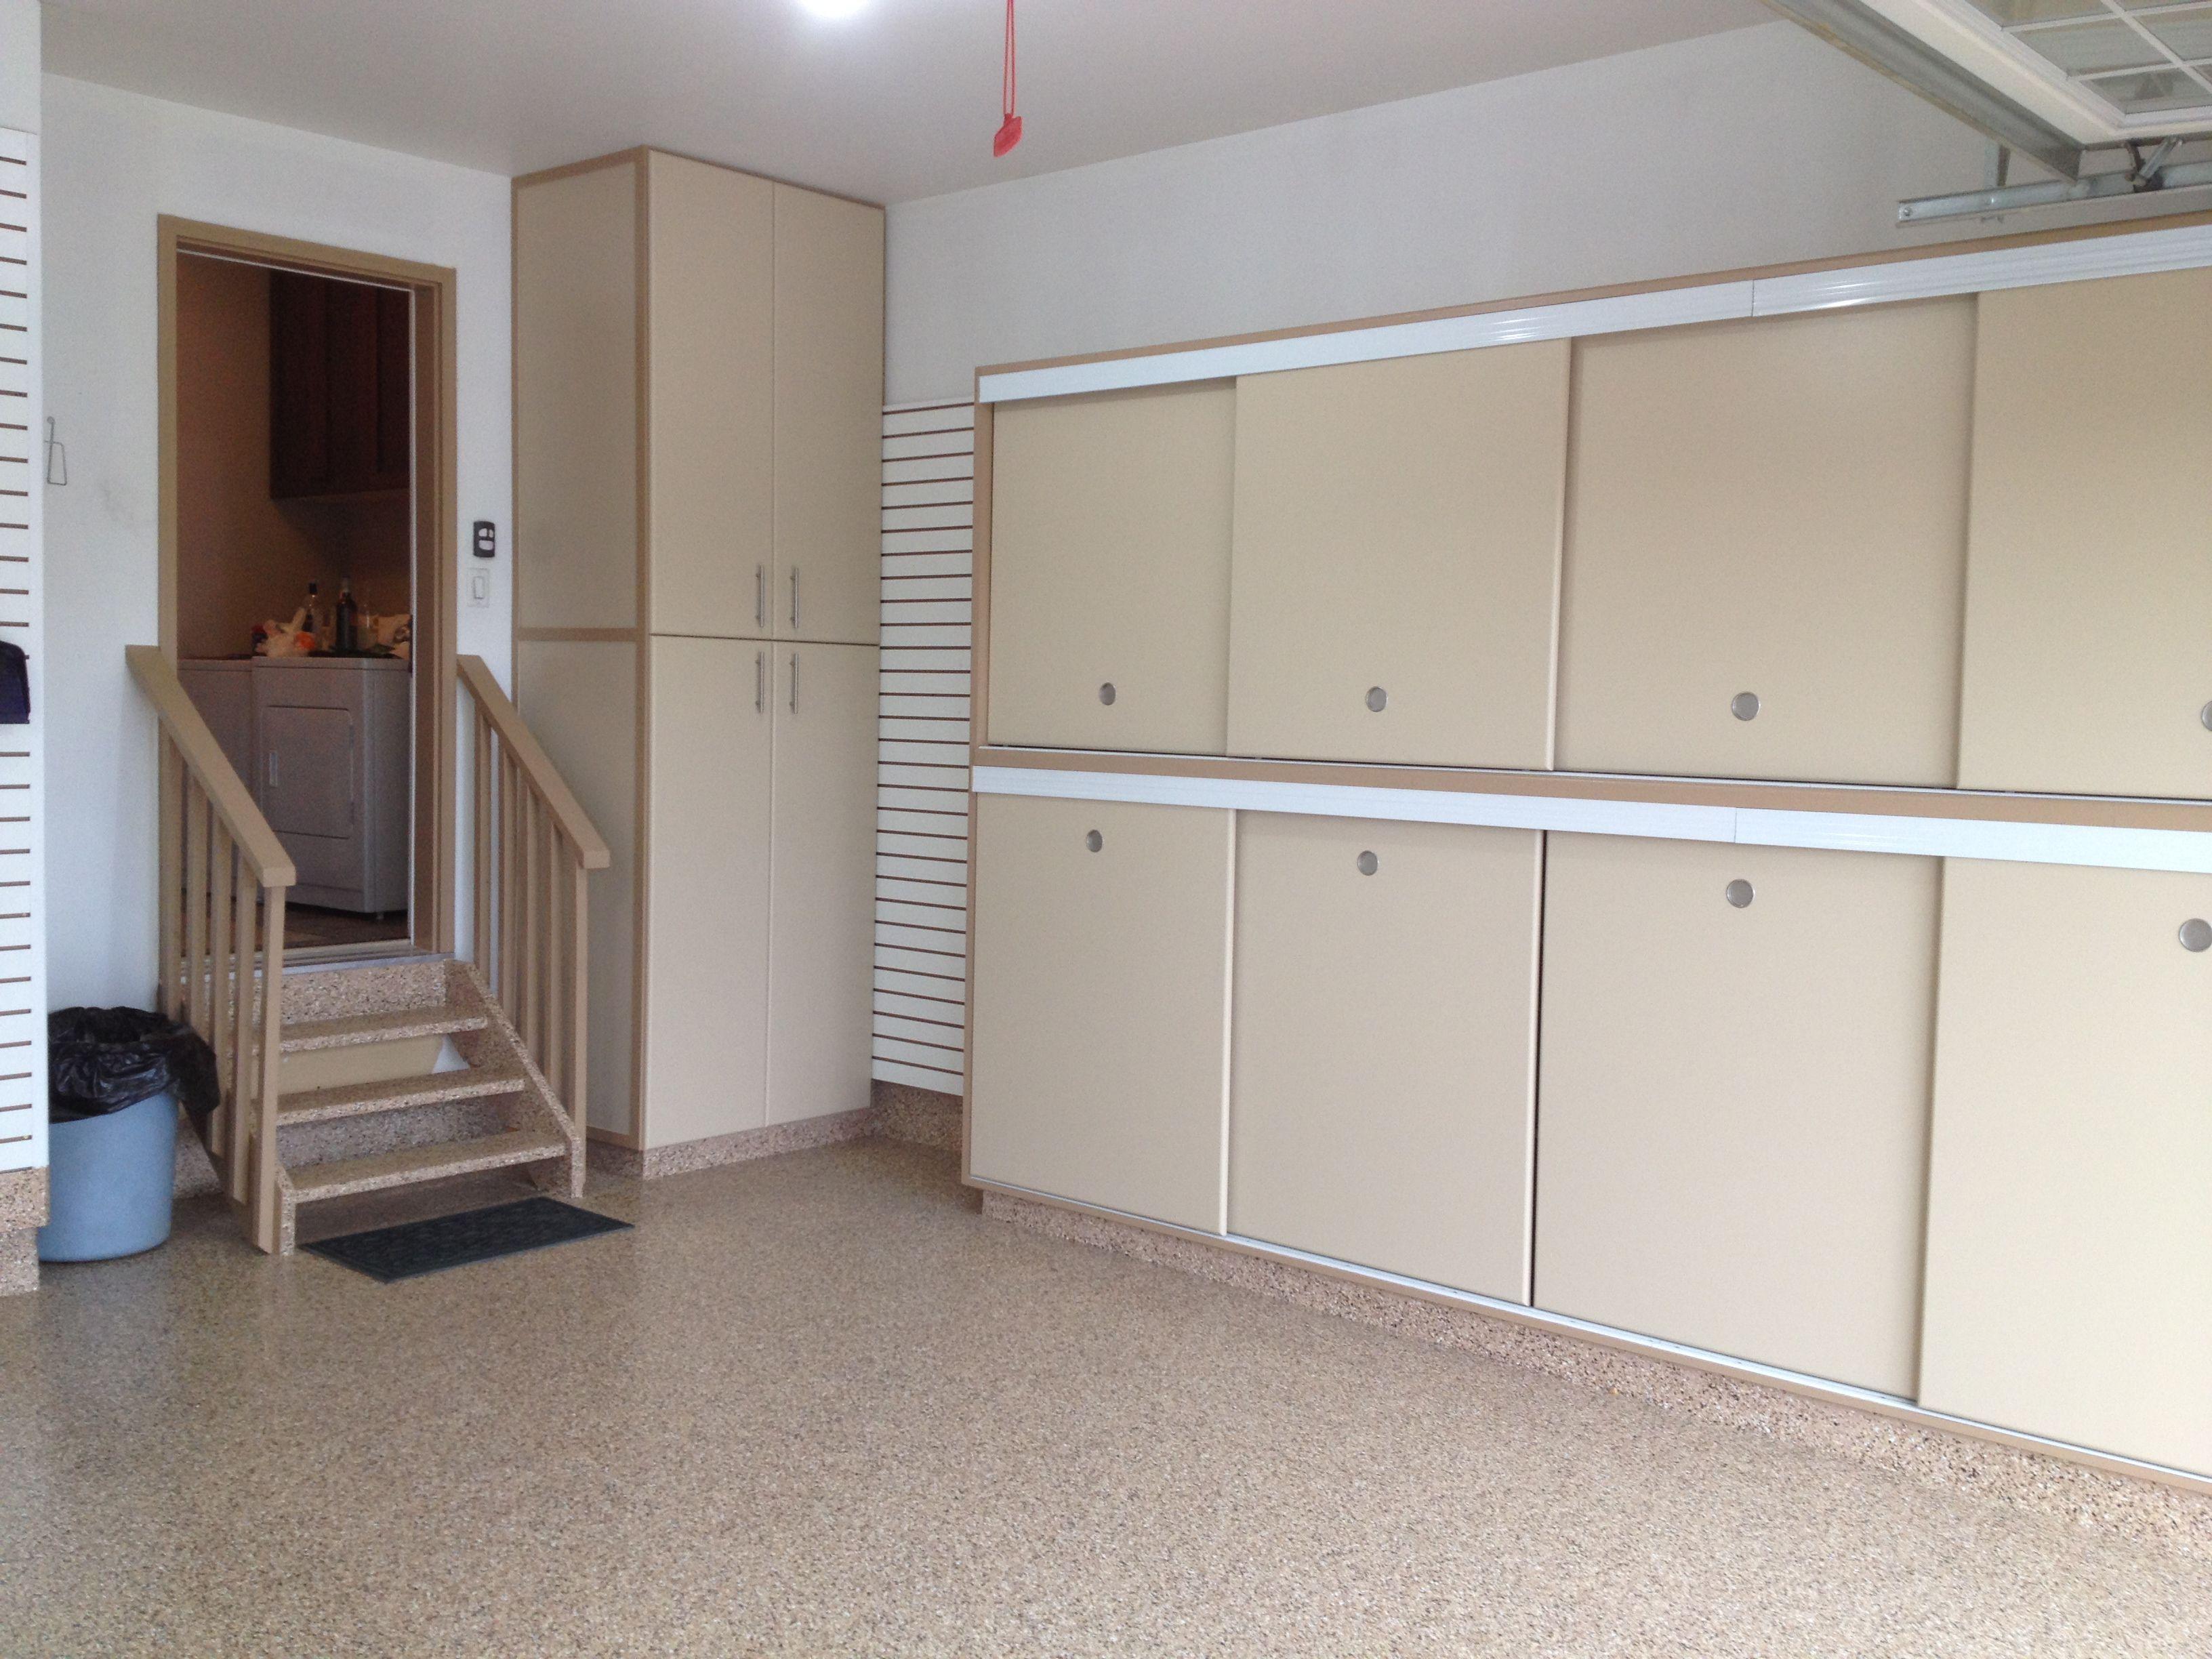 Gerry Garage Slotwall Epoxy Floor Custom Cabinets Sliding Doors